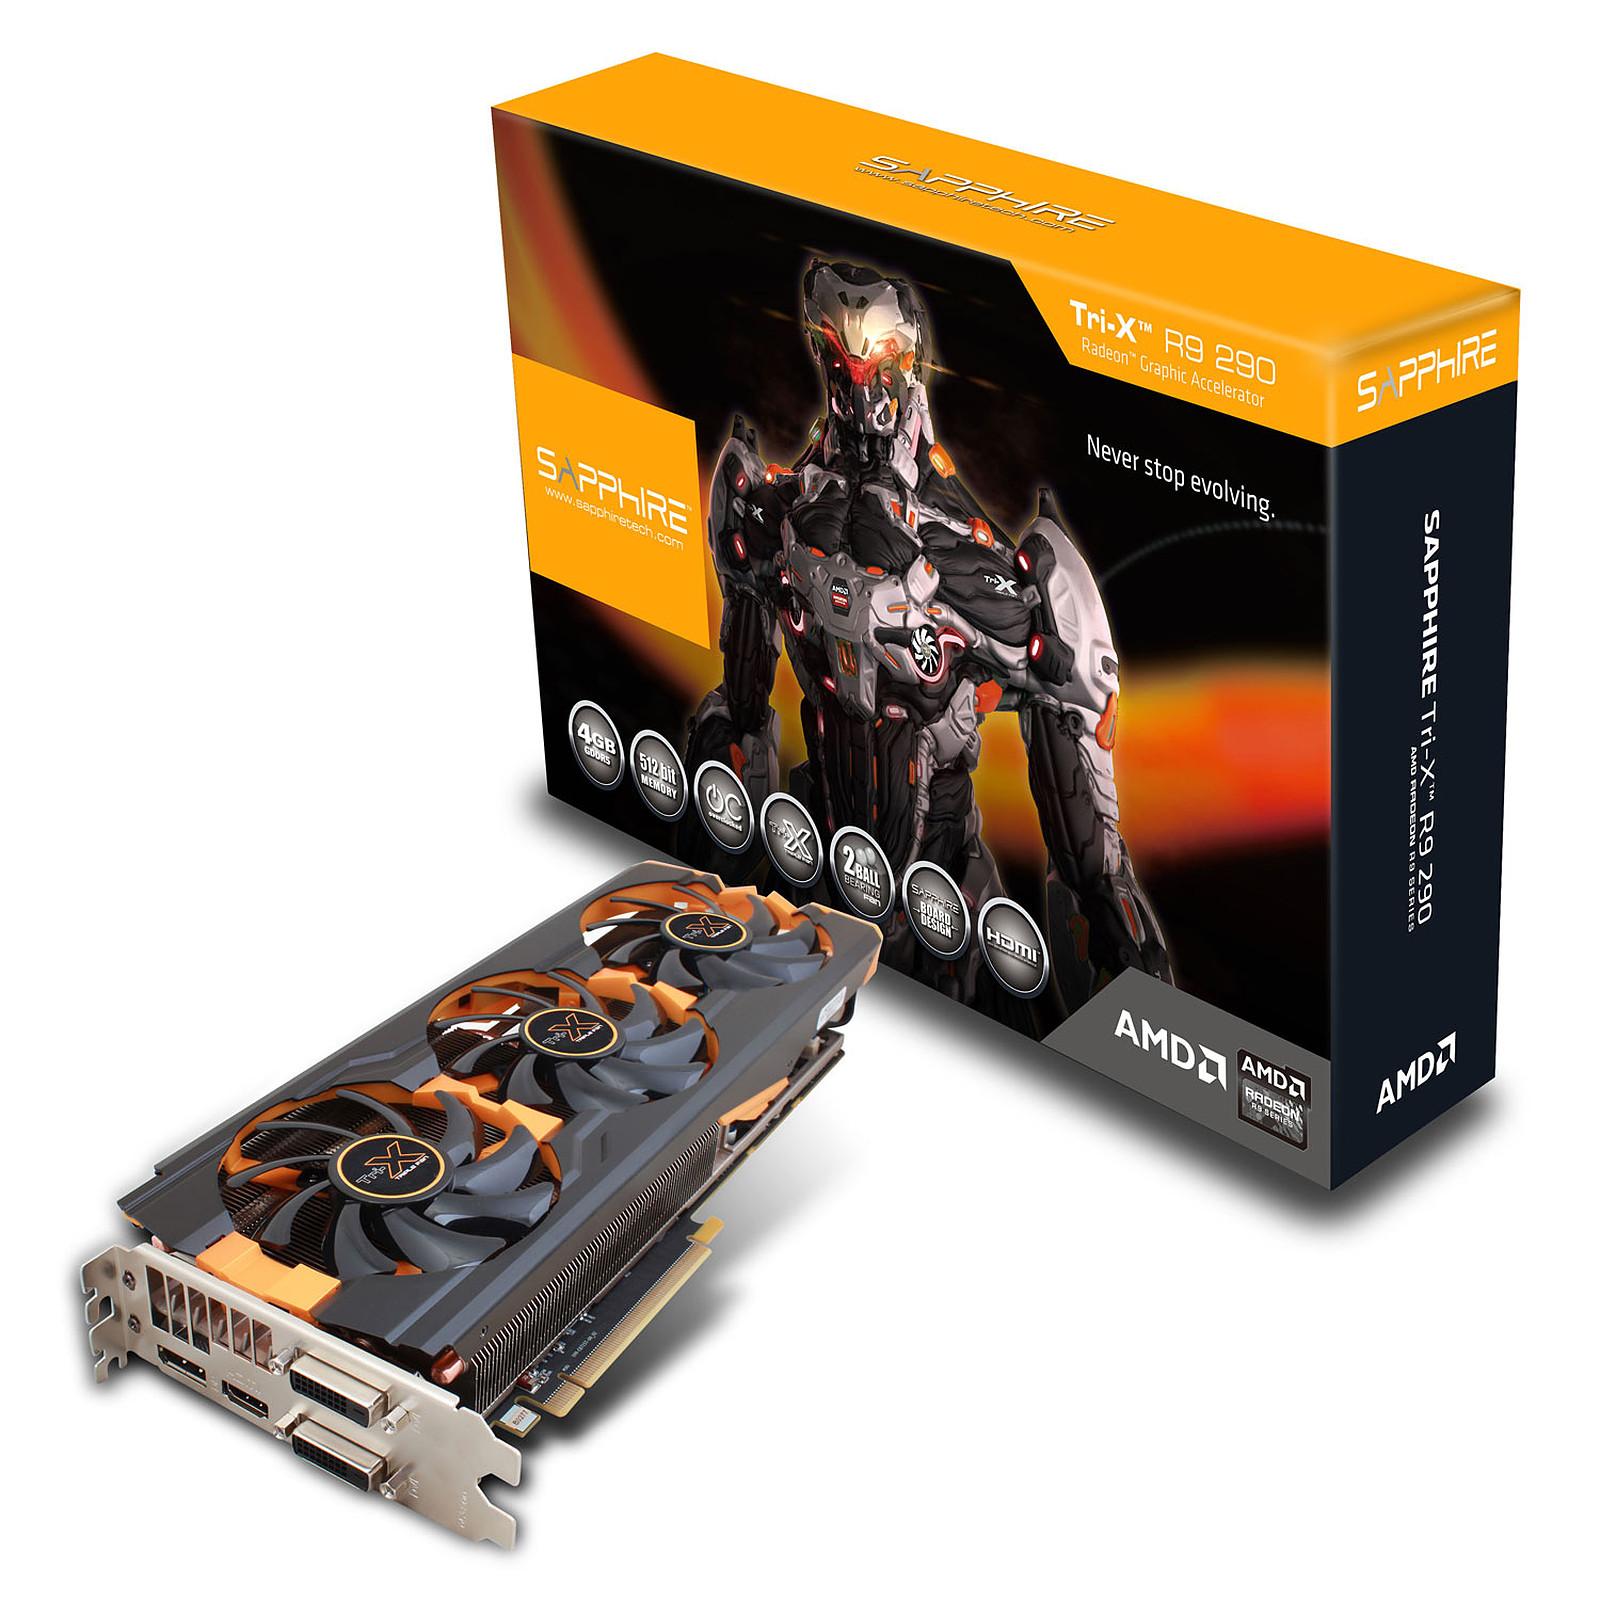 Sapphire Radeon R9 290 4G GDDR5 Tri-X OC (UEFI) - New Edition